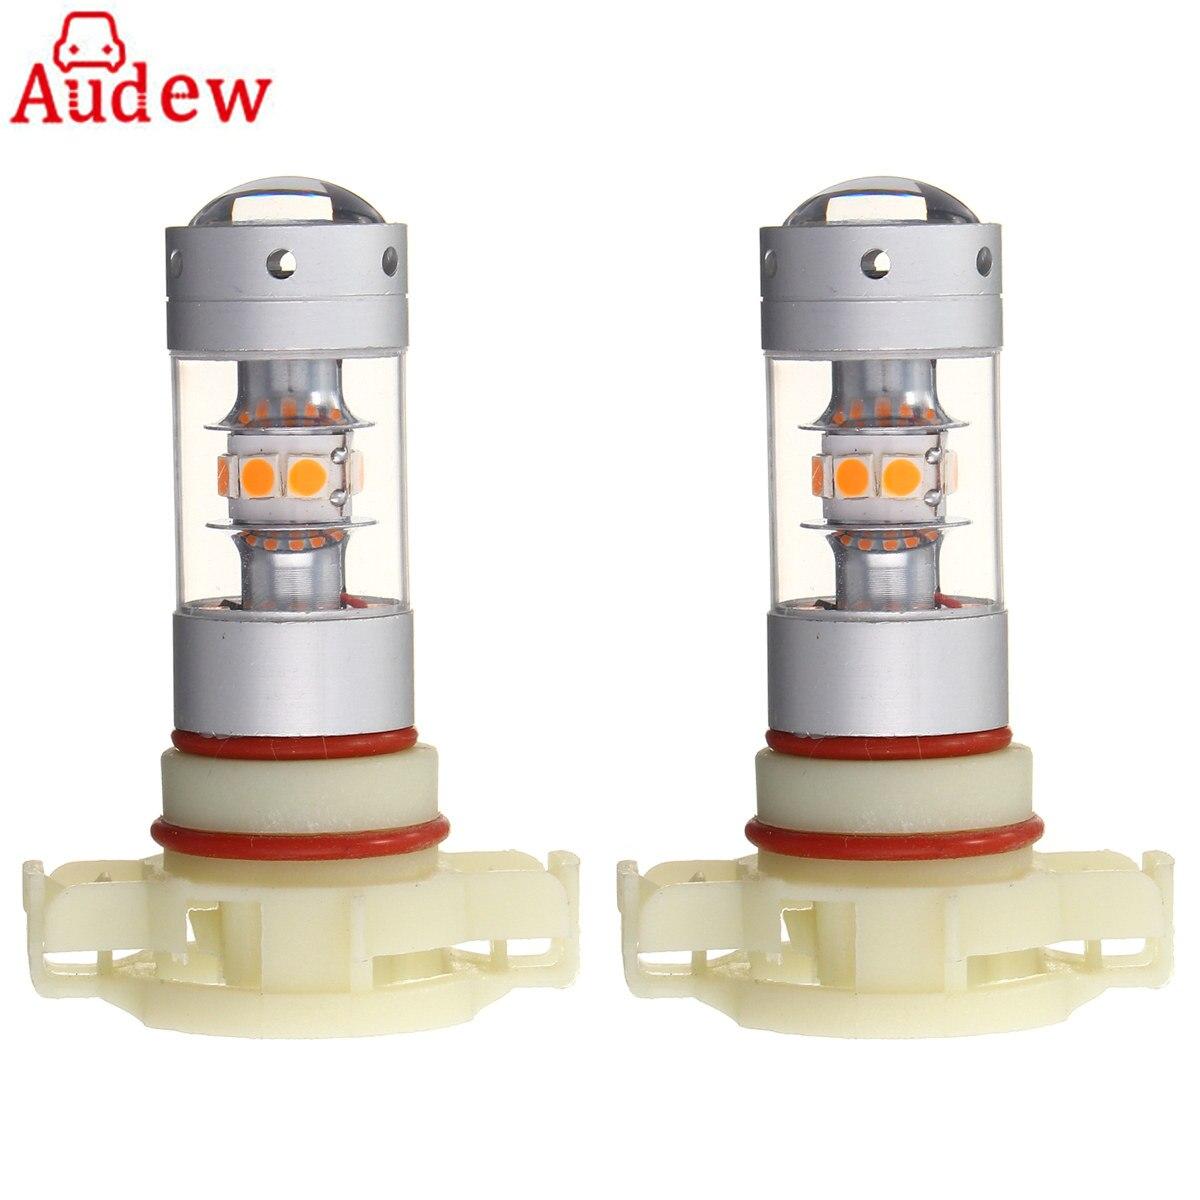 2Pcs Amber PY24W 28LED 140W Car font b Lamp b font Bulbs Universal Turn Signal Light